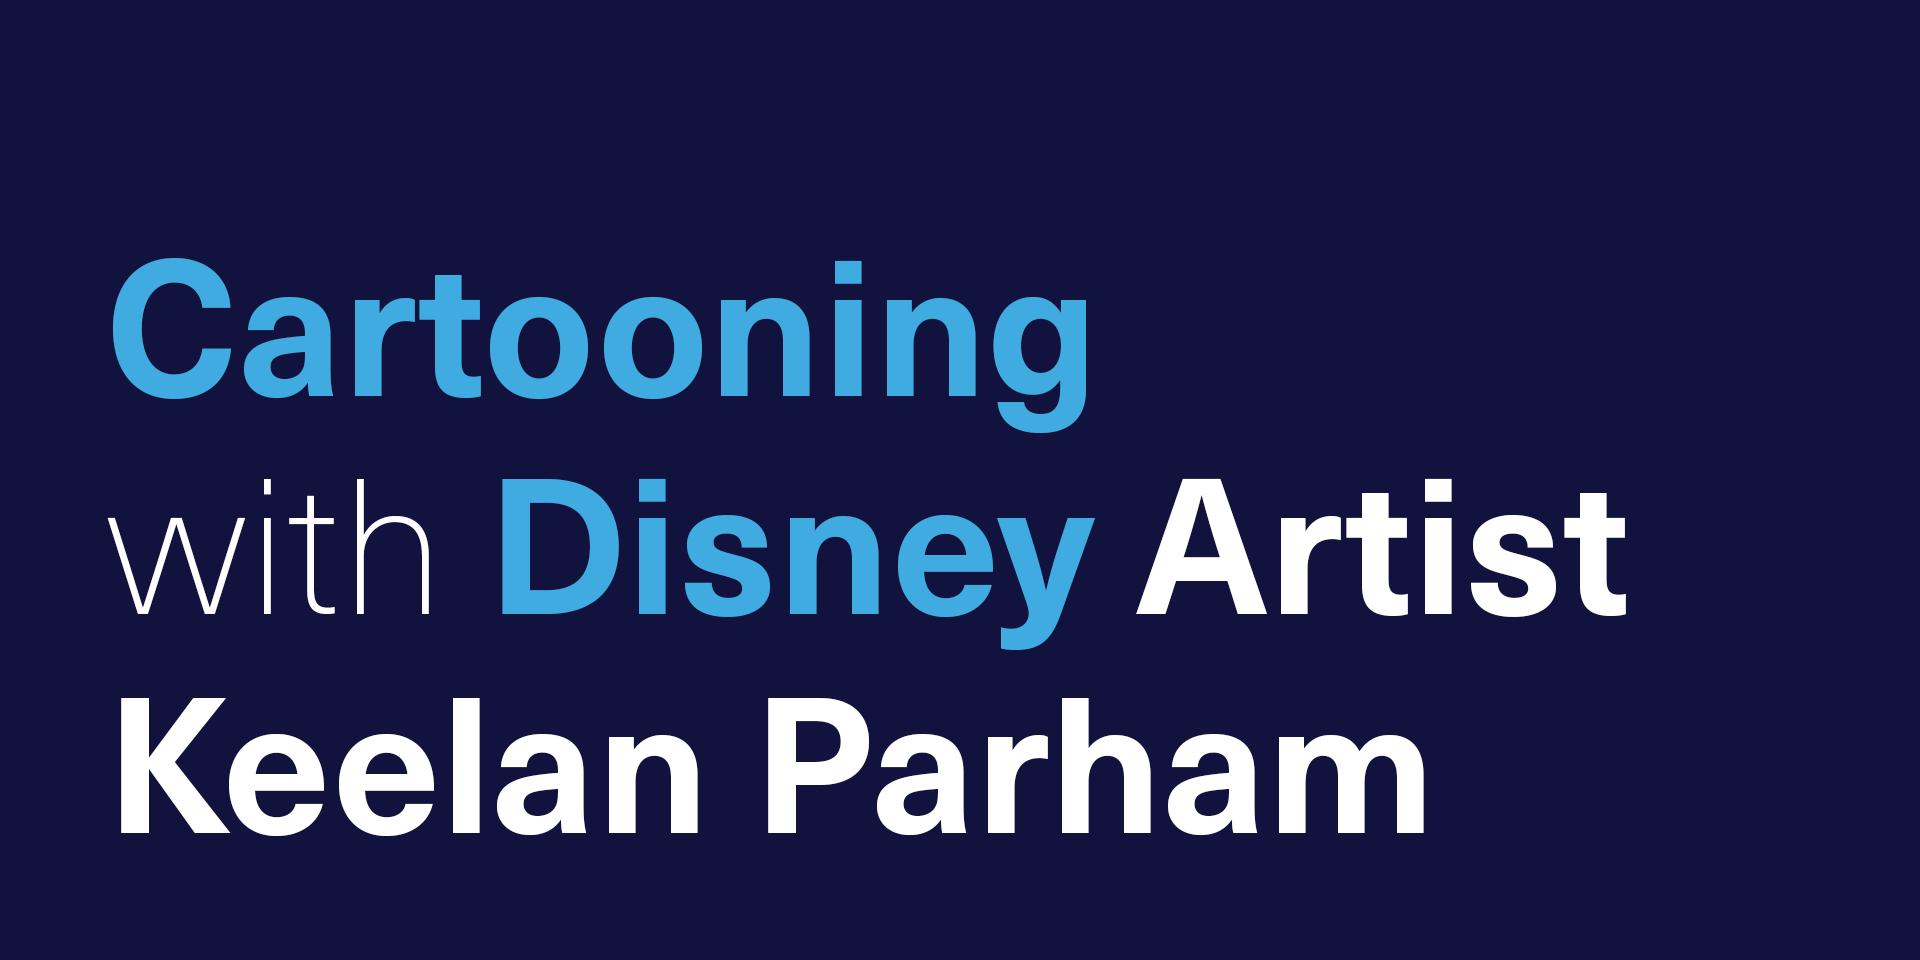 [VIRTUAL] Cartooning with Disney Artist Keelan Parham